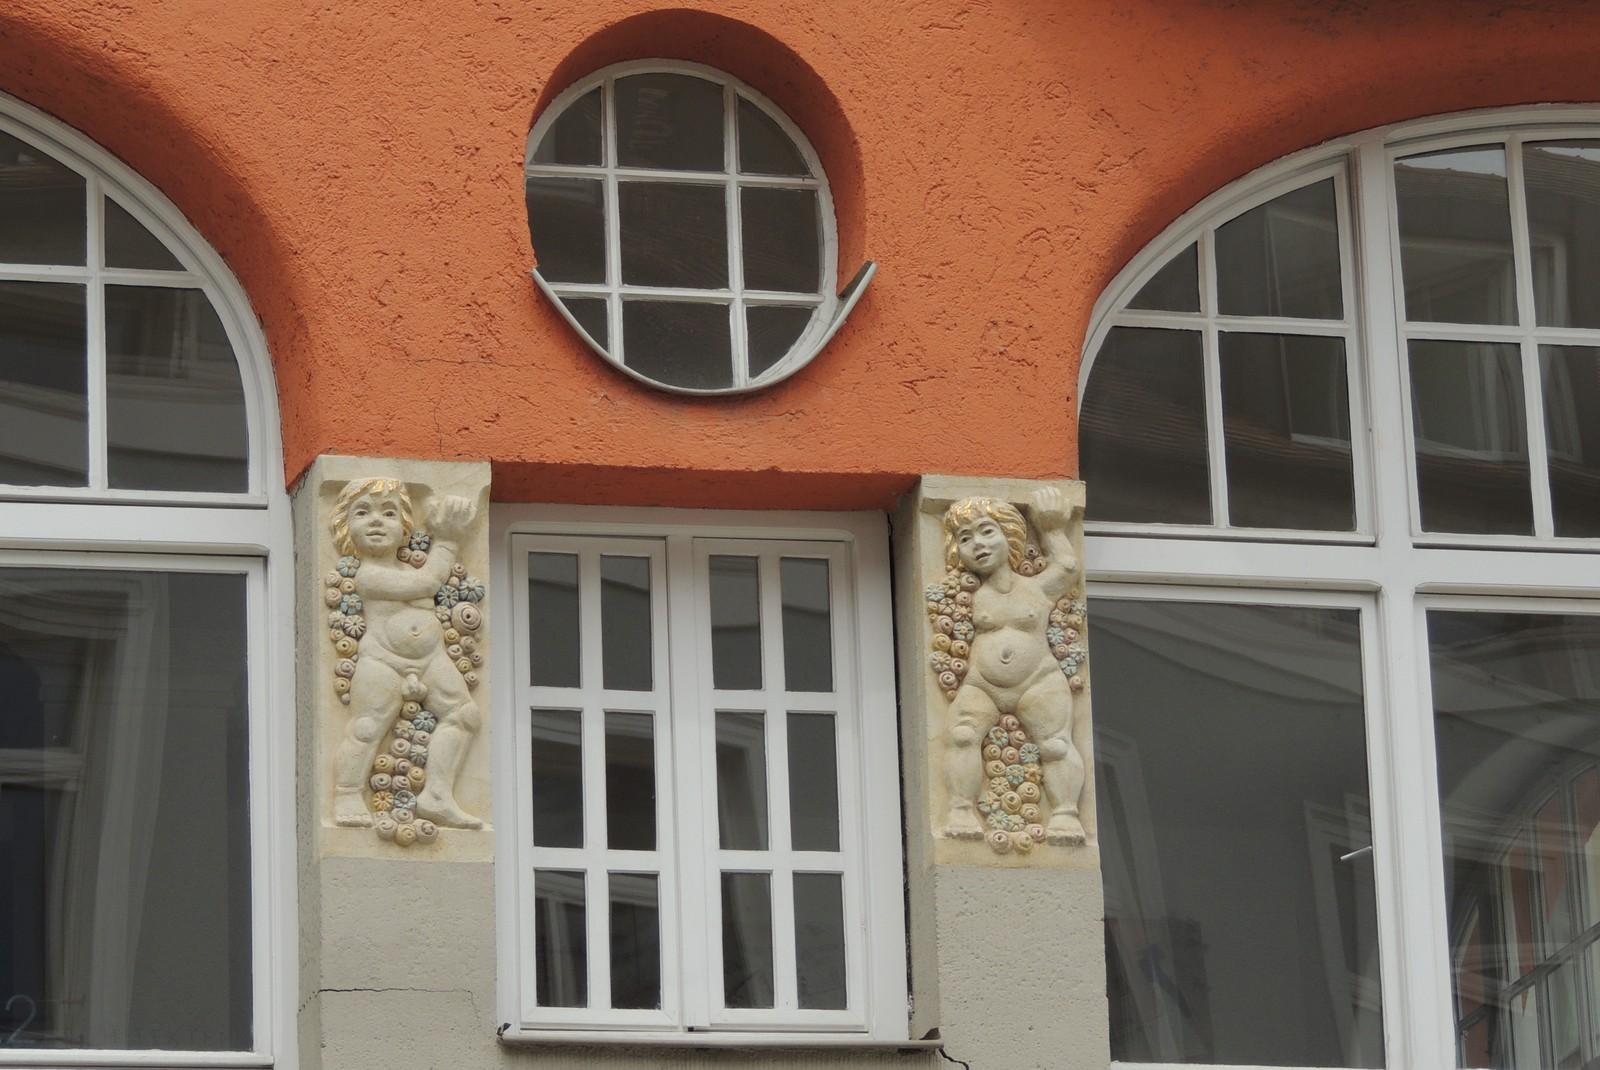 Fassade in der Oberen Bachgasse